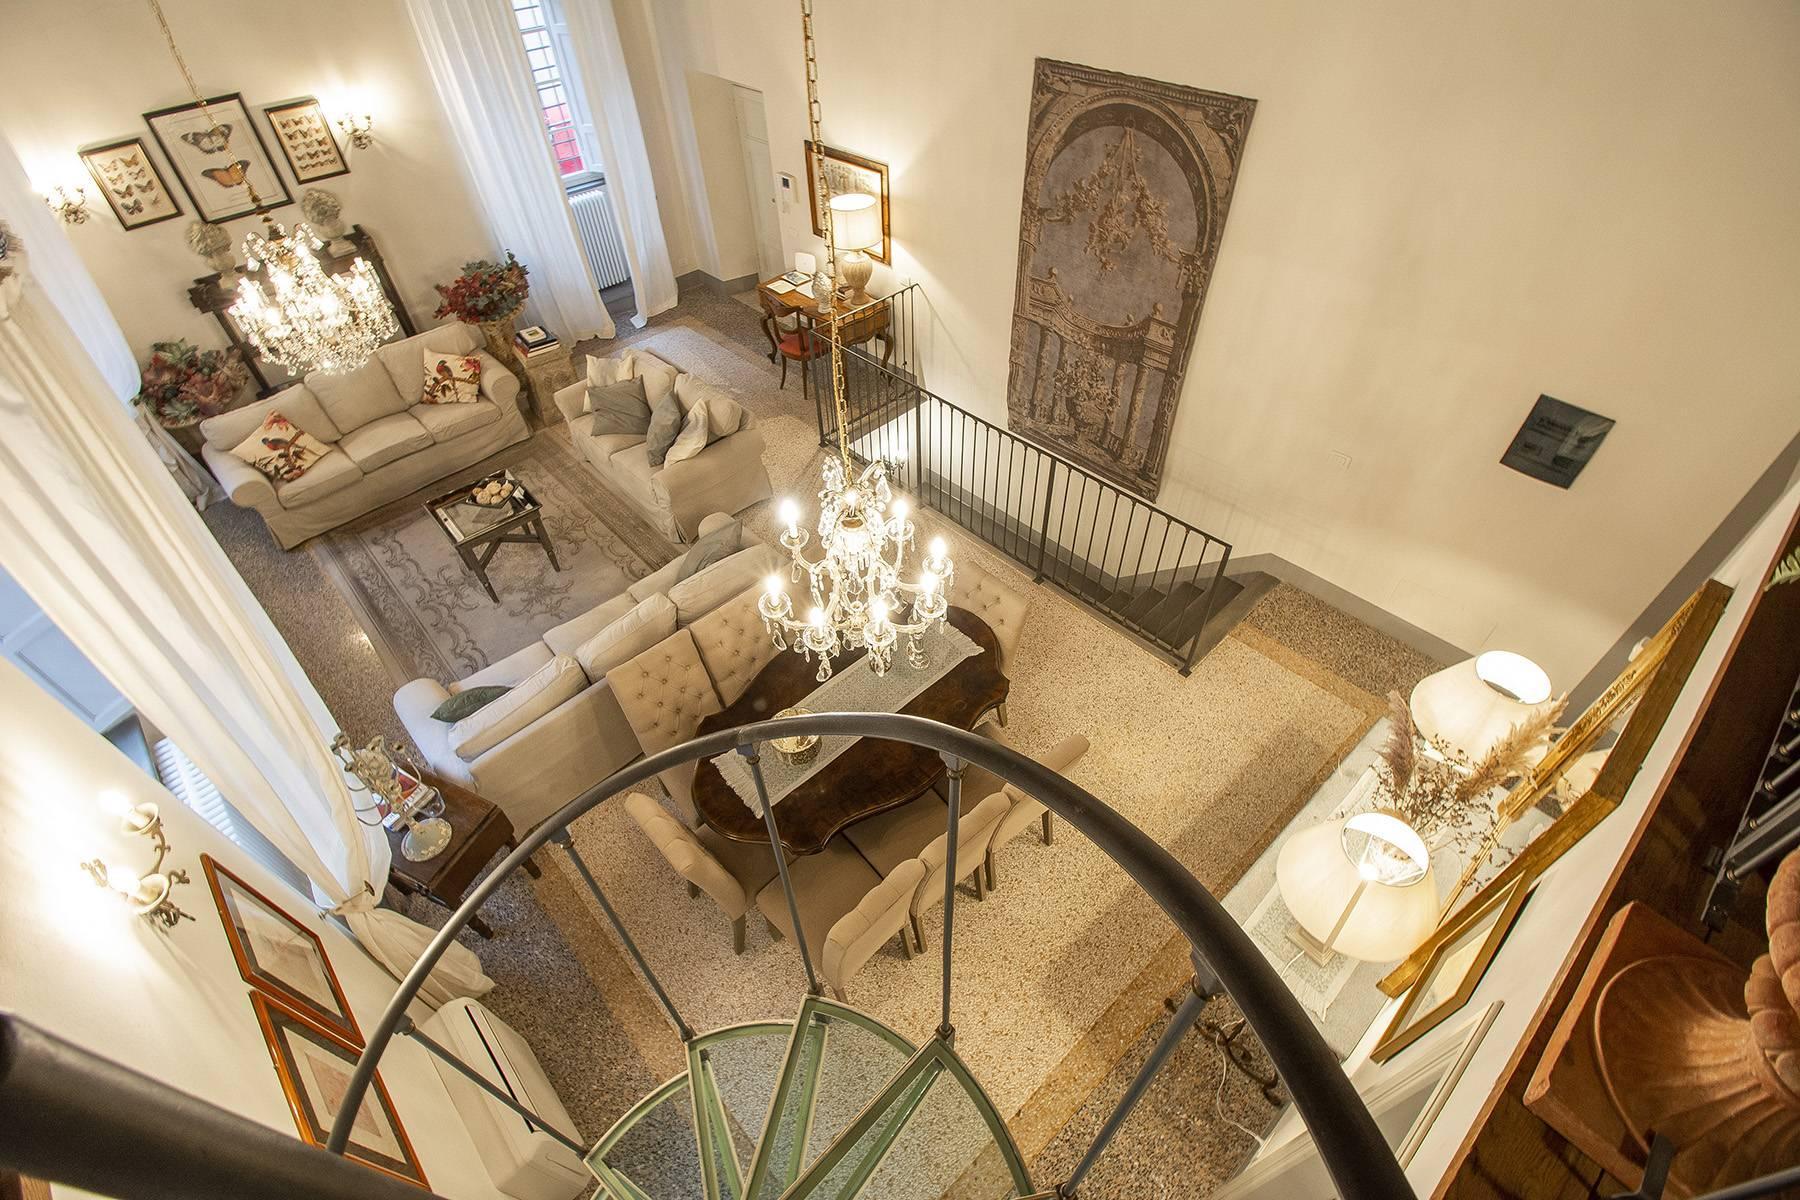 Appartement exclusif au coeur de Lucca - 6